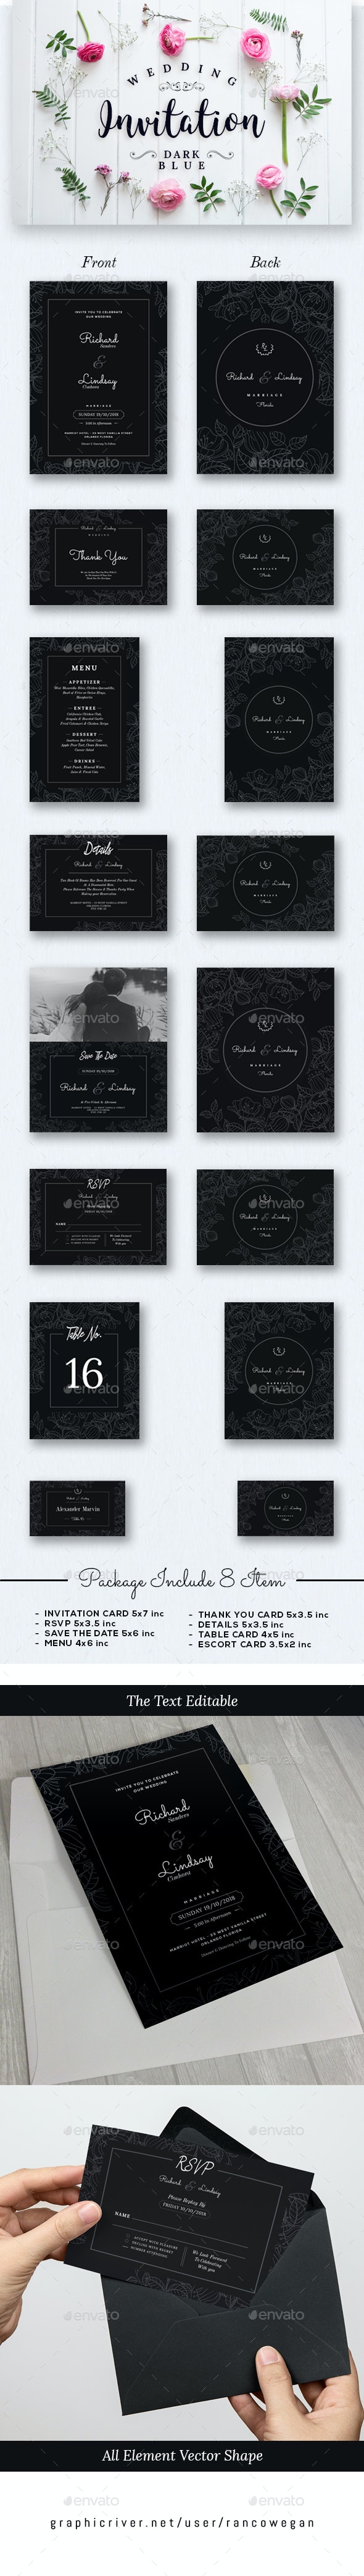 Wdding Invitation Set Dark Blue - Cards & Invites Print Templates